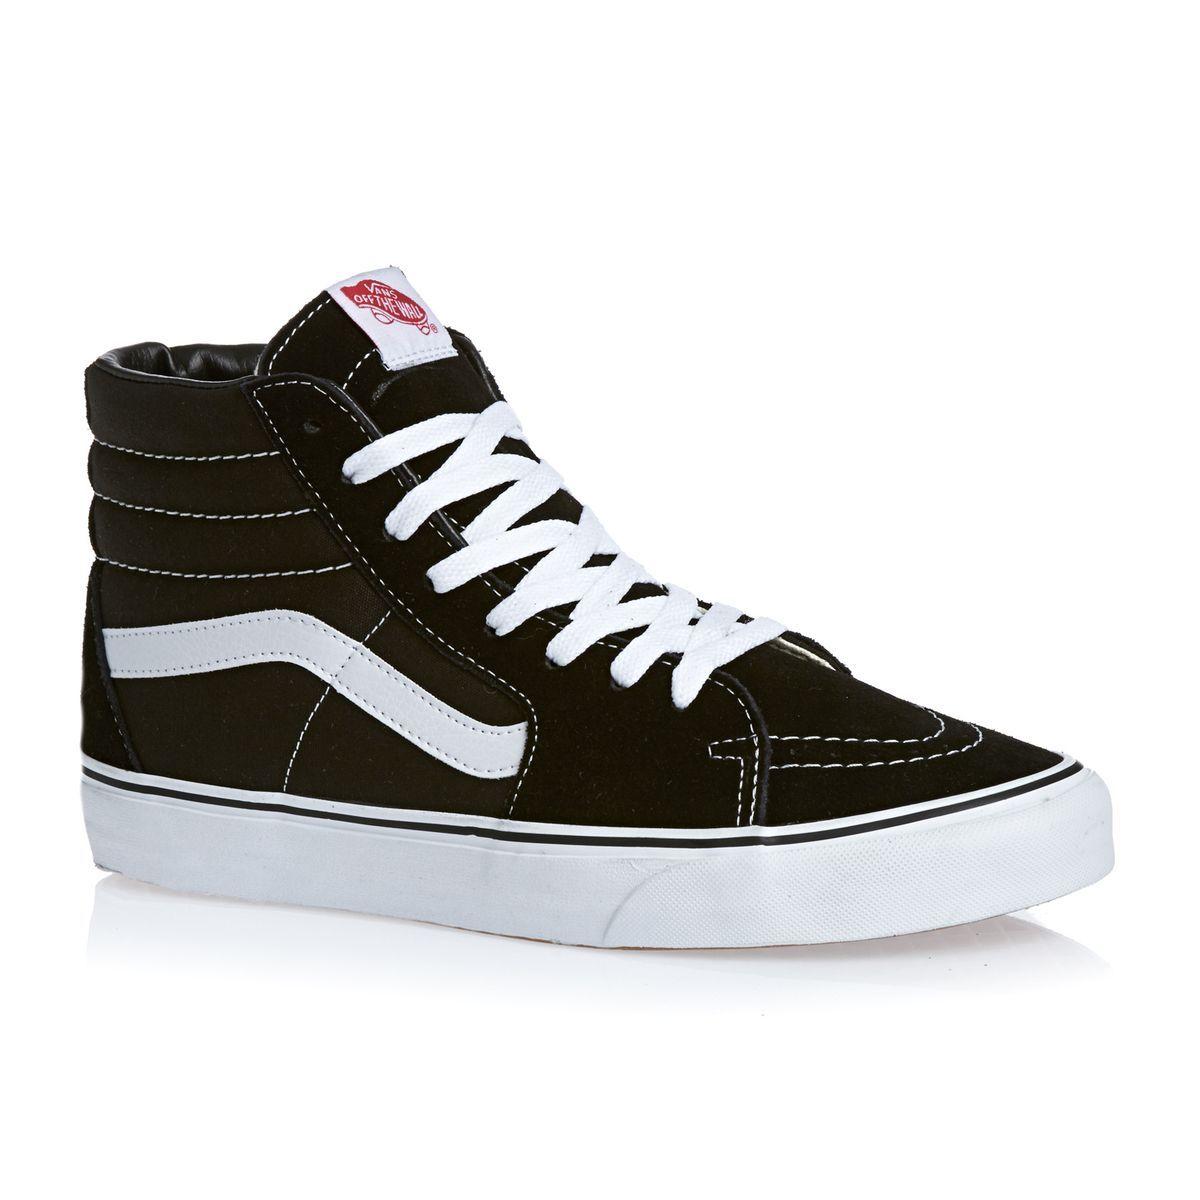 Vans Sk8-hi Shoes - Black in 2020